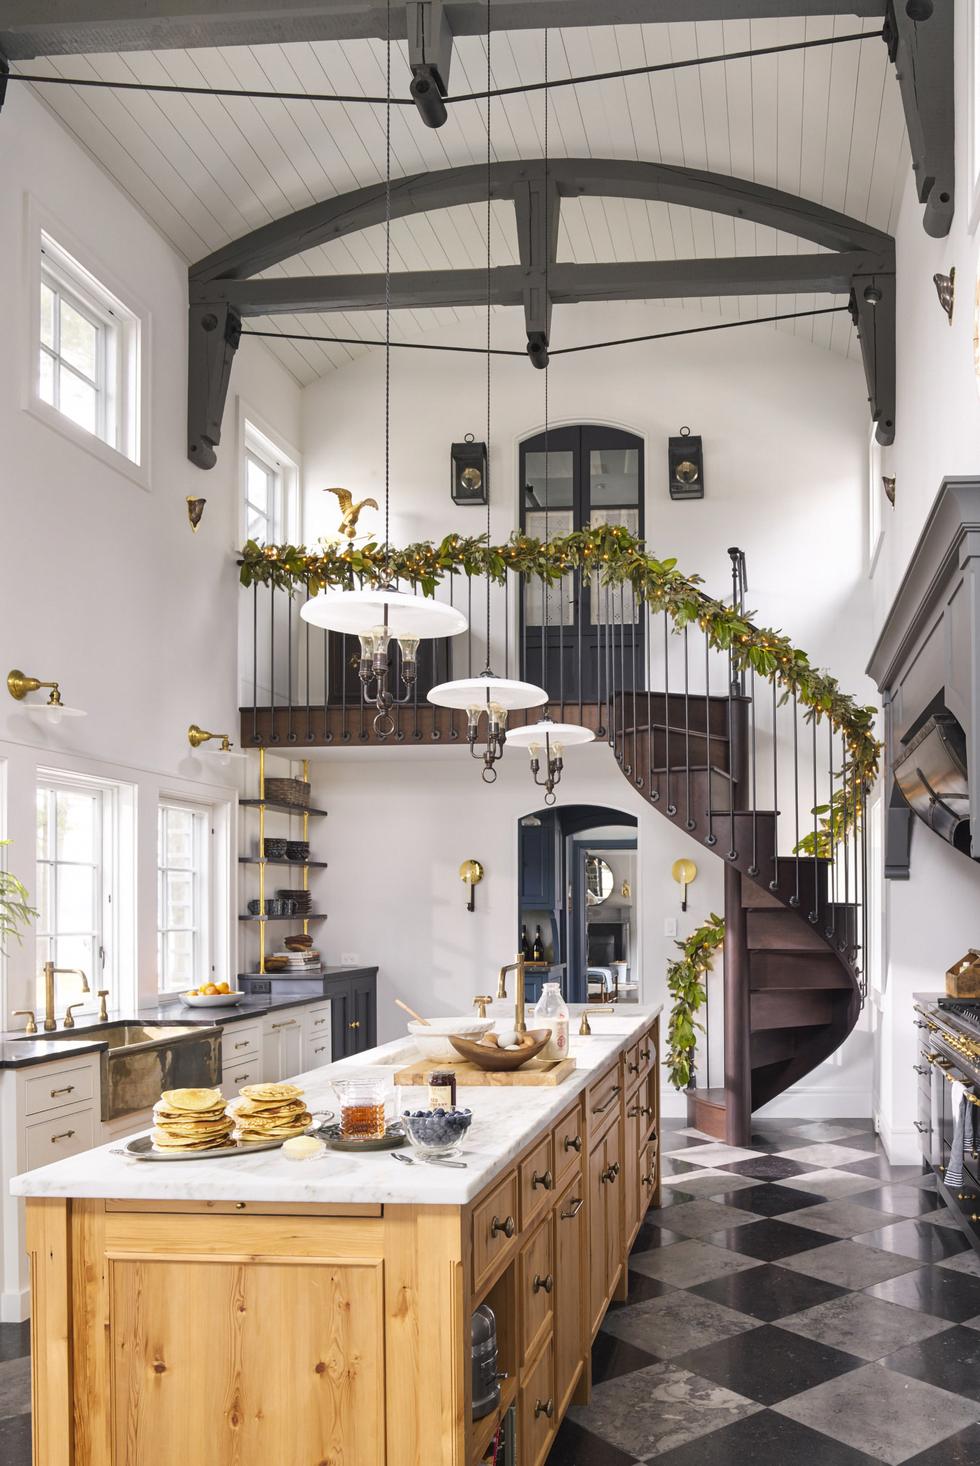 Anni 70 Arredamento our list of 45 vintage kitchen design and decor ideas offers